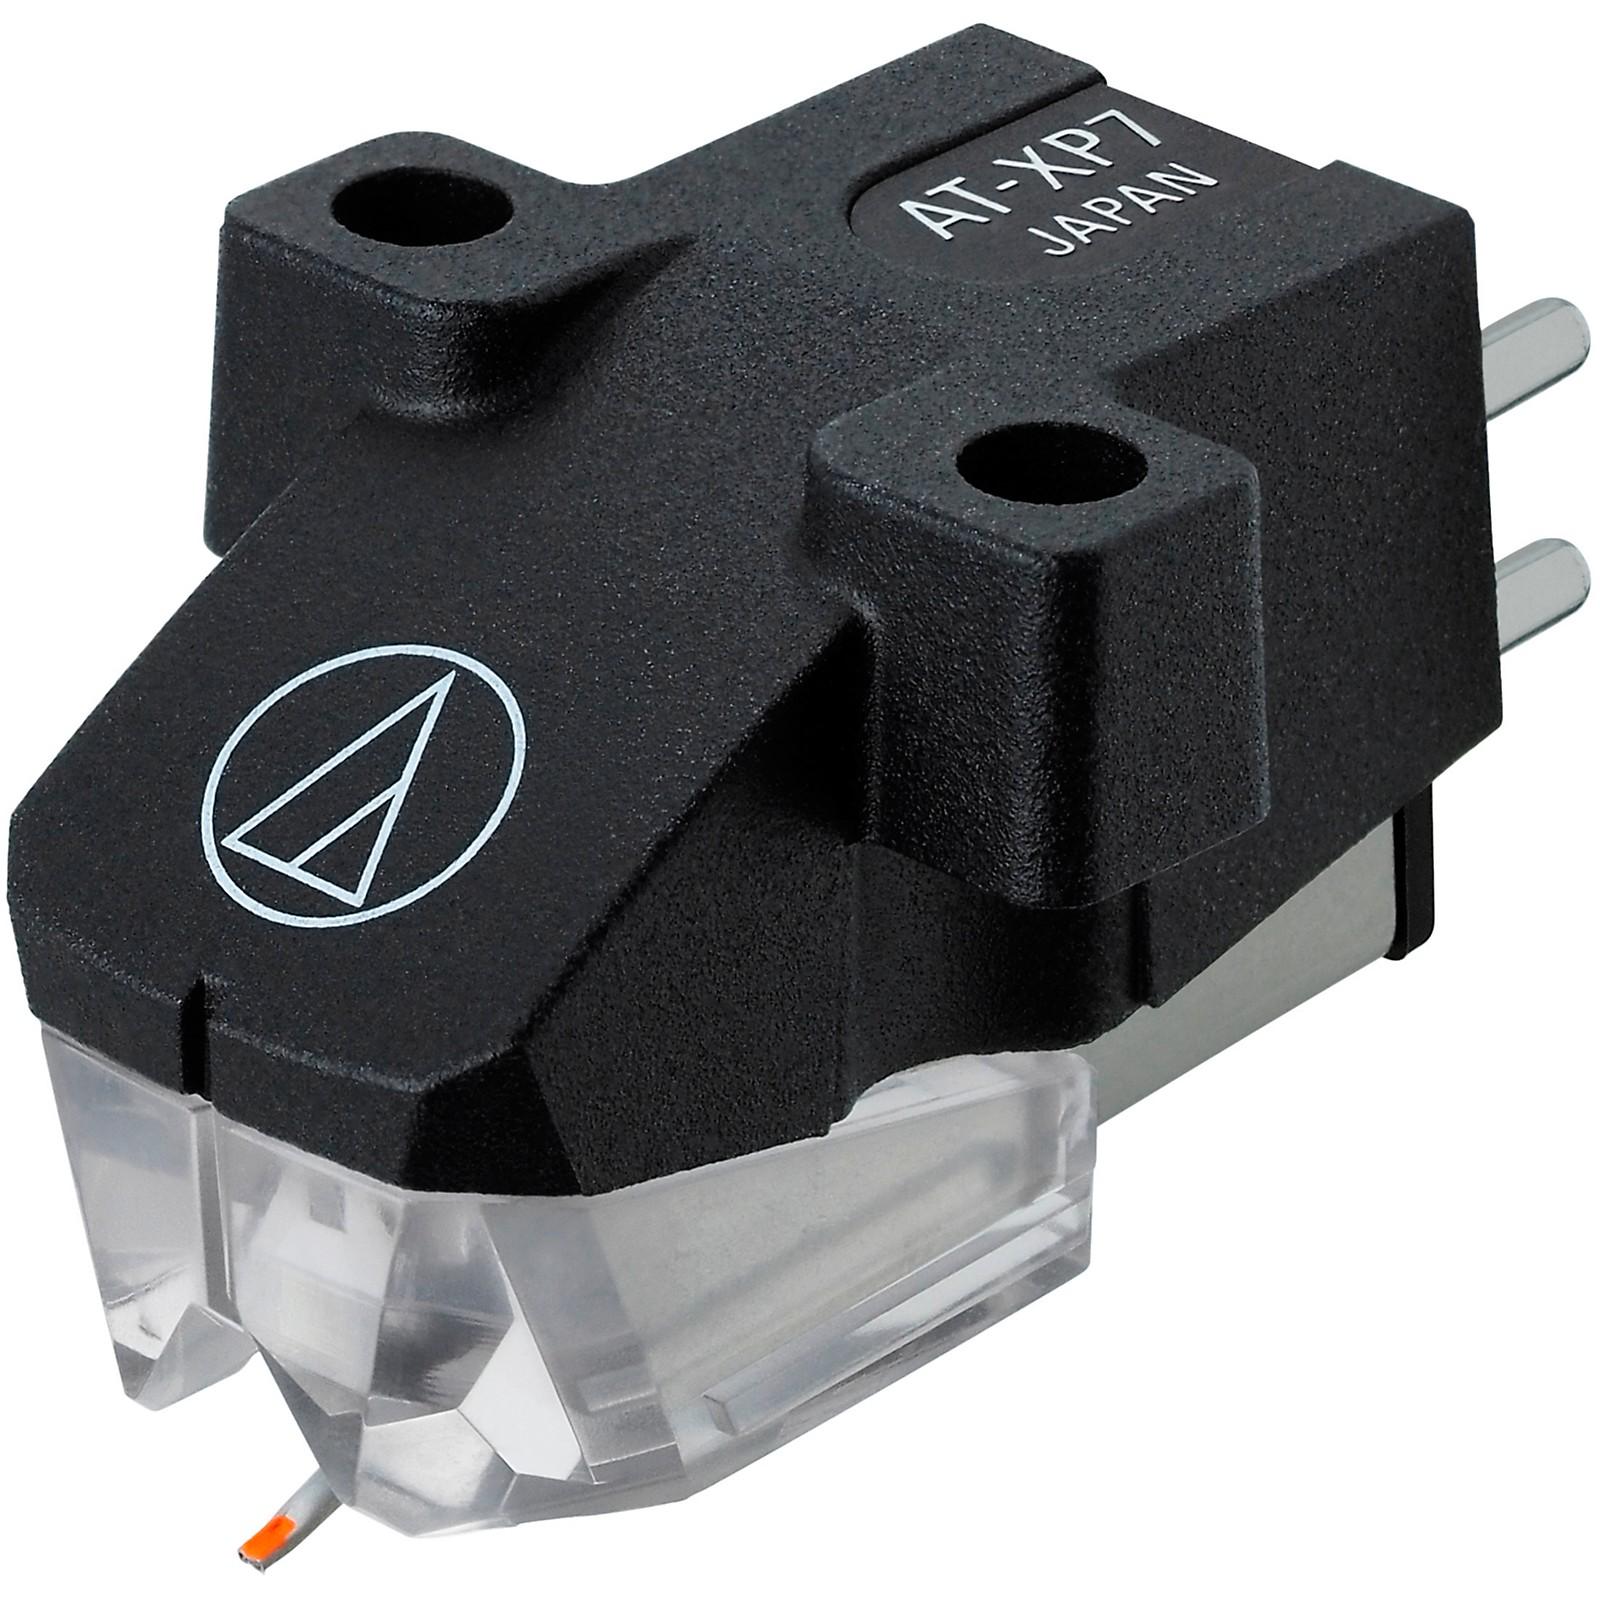 Audio-Technica AT-XP7 DJ Cartridge